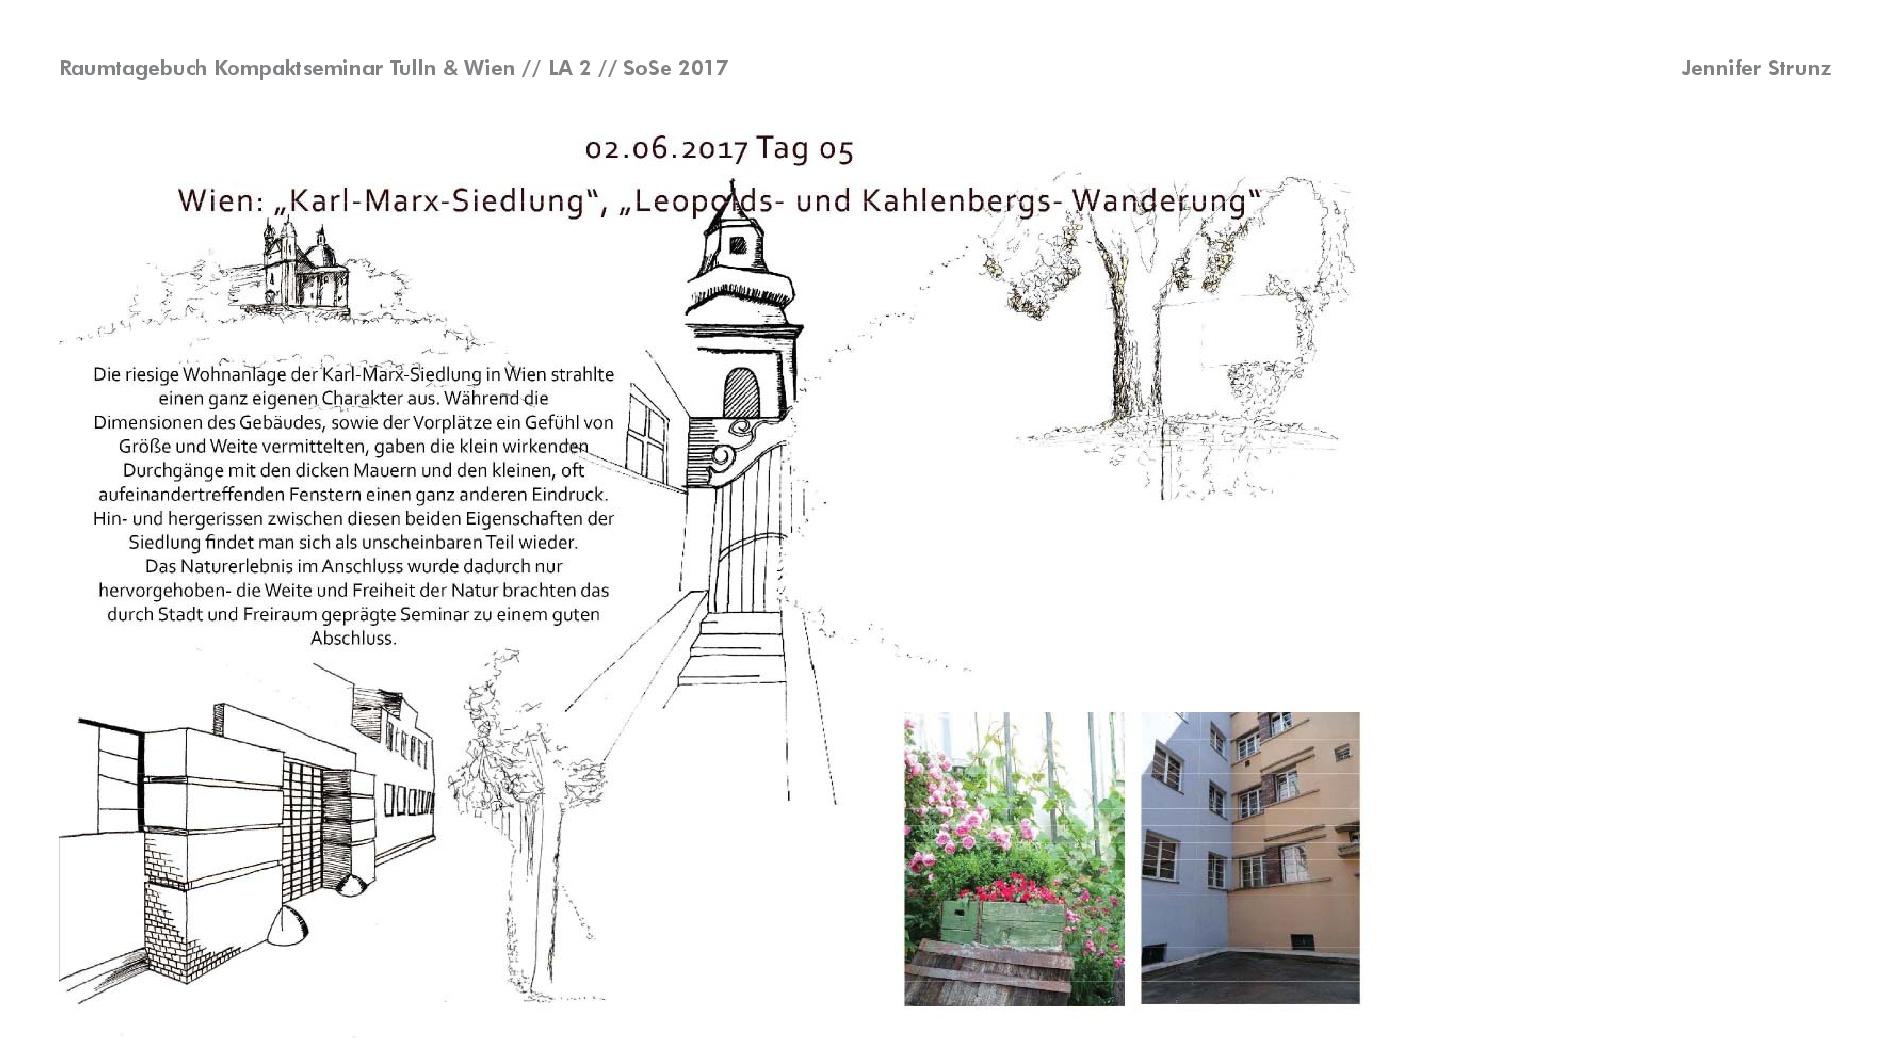 NEU Screen Raumtagebuch Tulln Wien SoSe 17 031